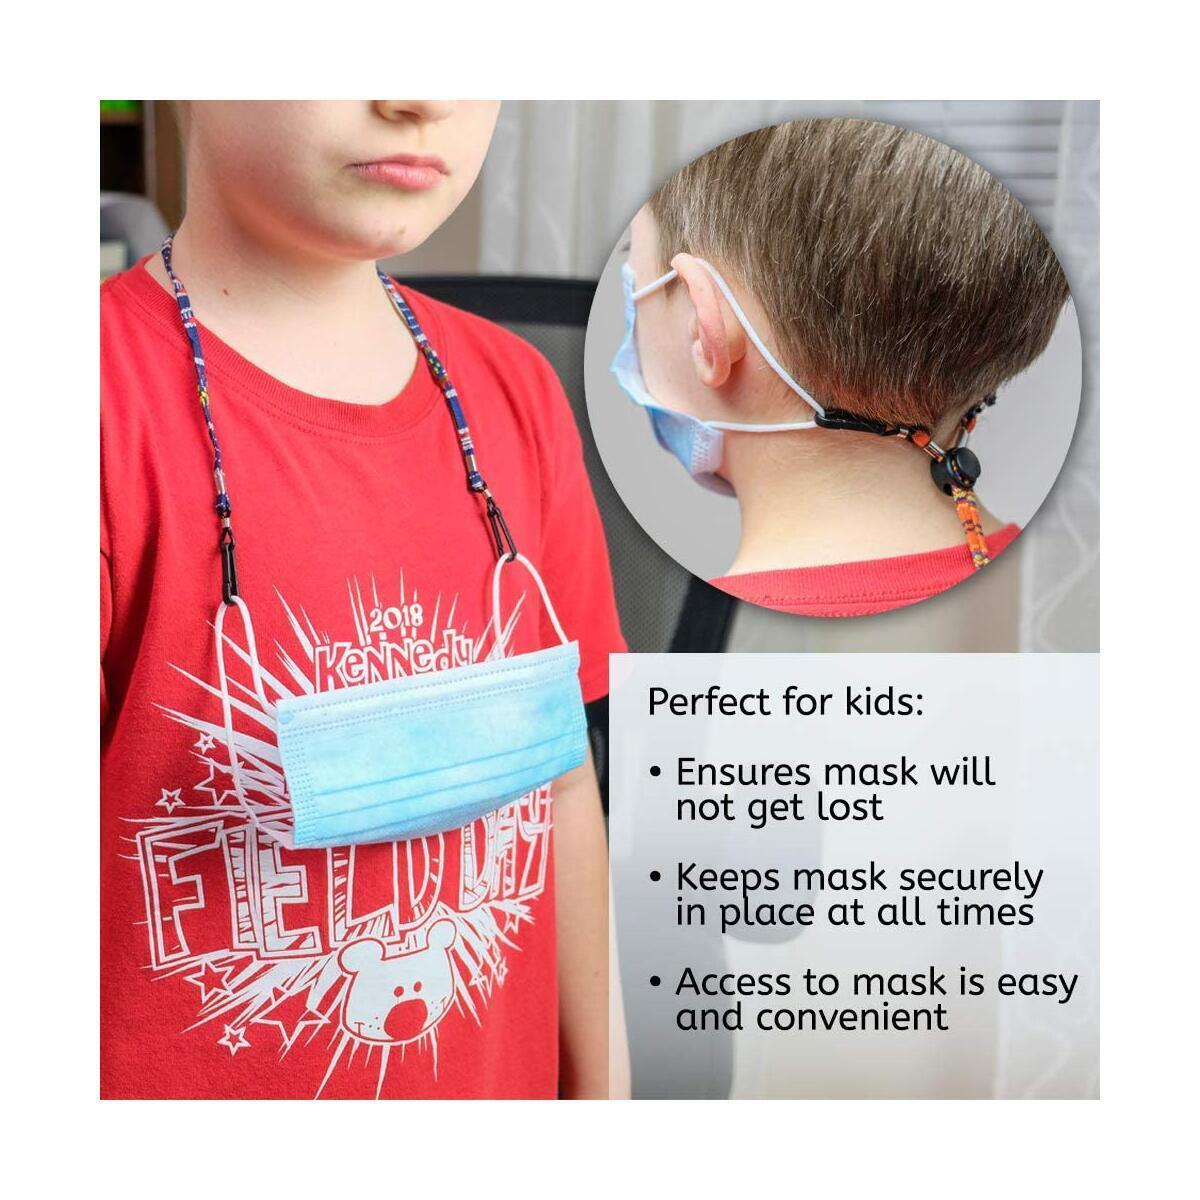 Globi Mask Lanyard For Kids/Adults | Adjustable Unisex Face Mask/Glasses Holder With Clips | Mask/Glasses Strap For Boys Girls Men Women